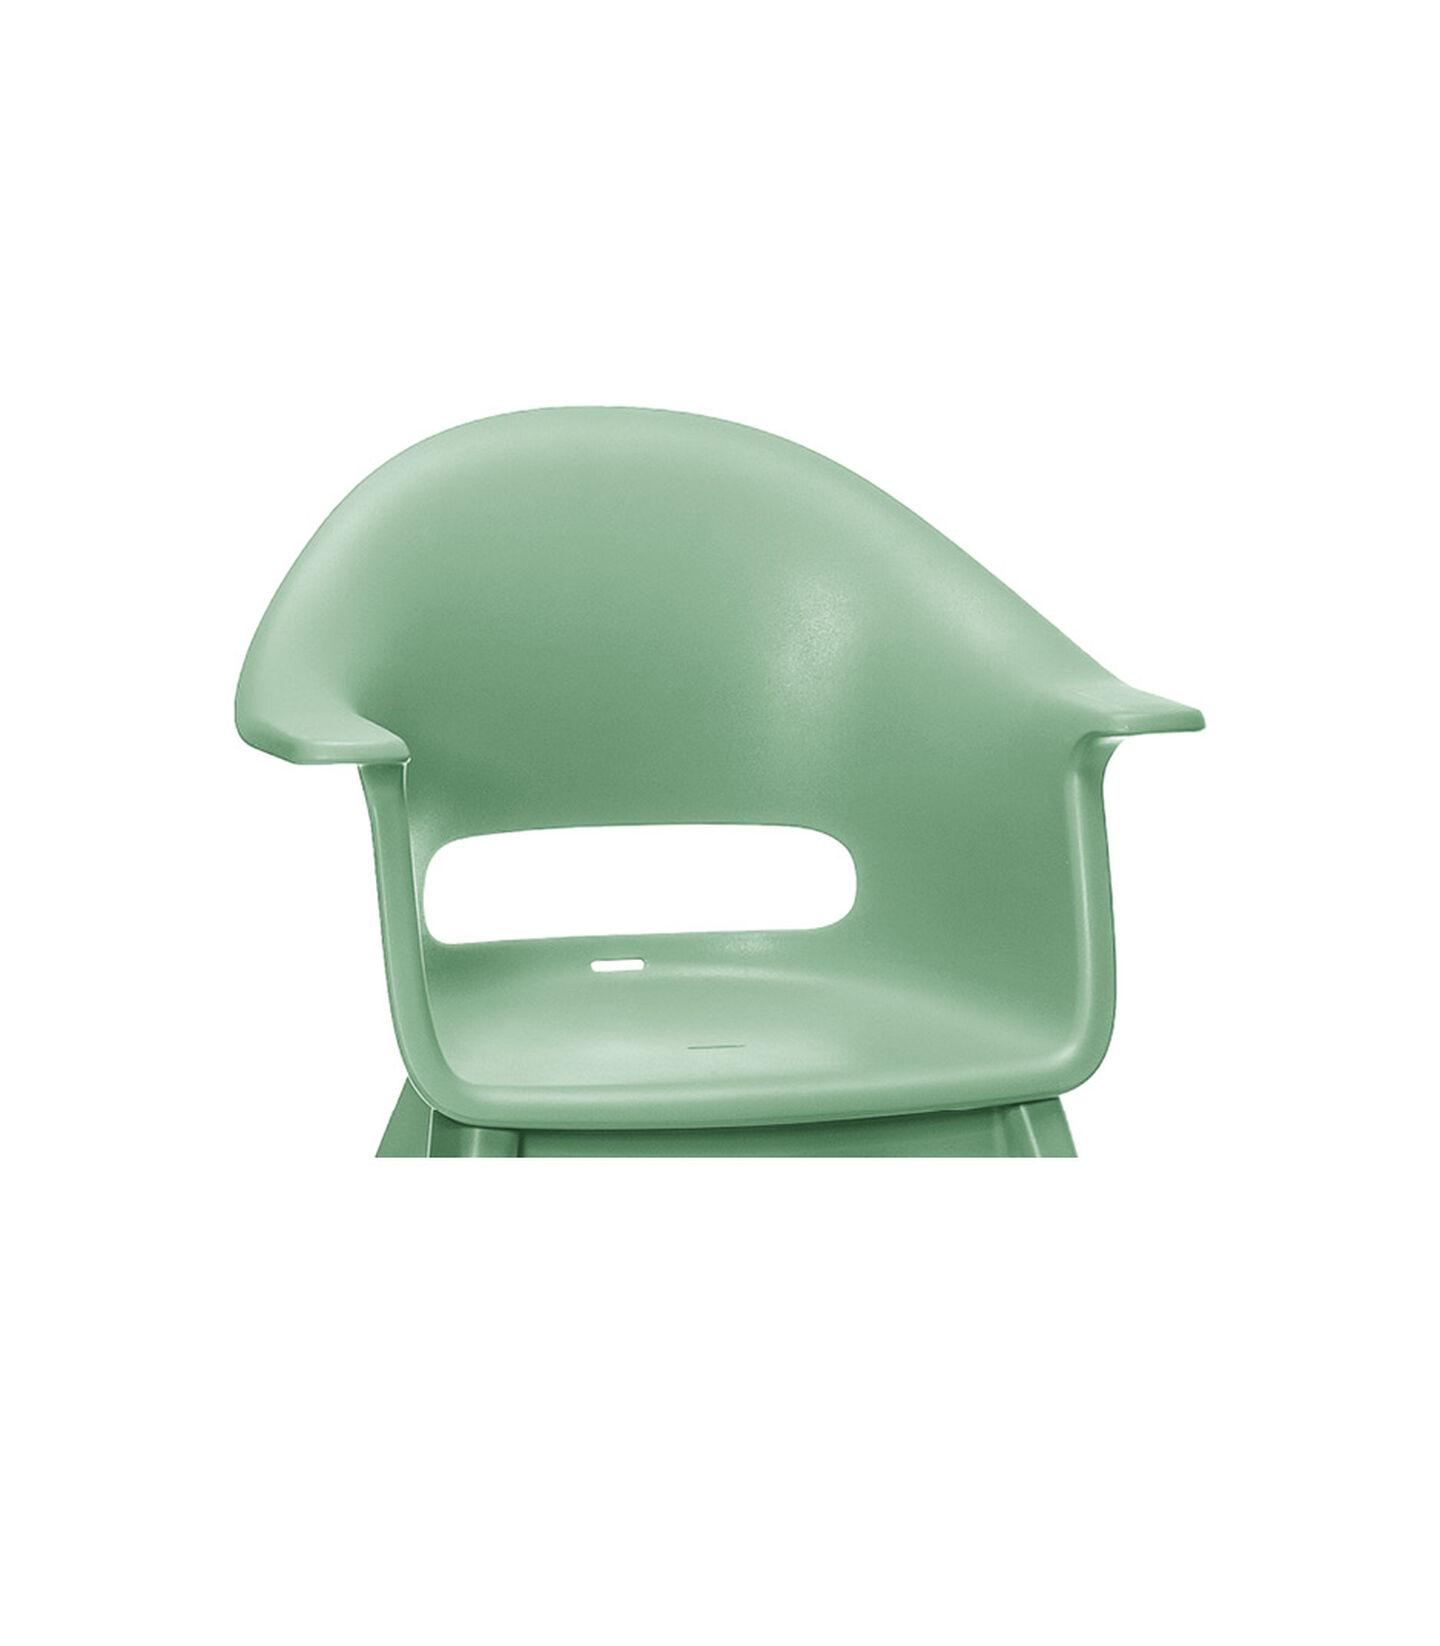 Stokke® Clikk™ Seat Clover Green, Clover Green, mainview view 1